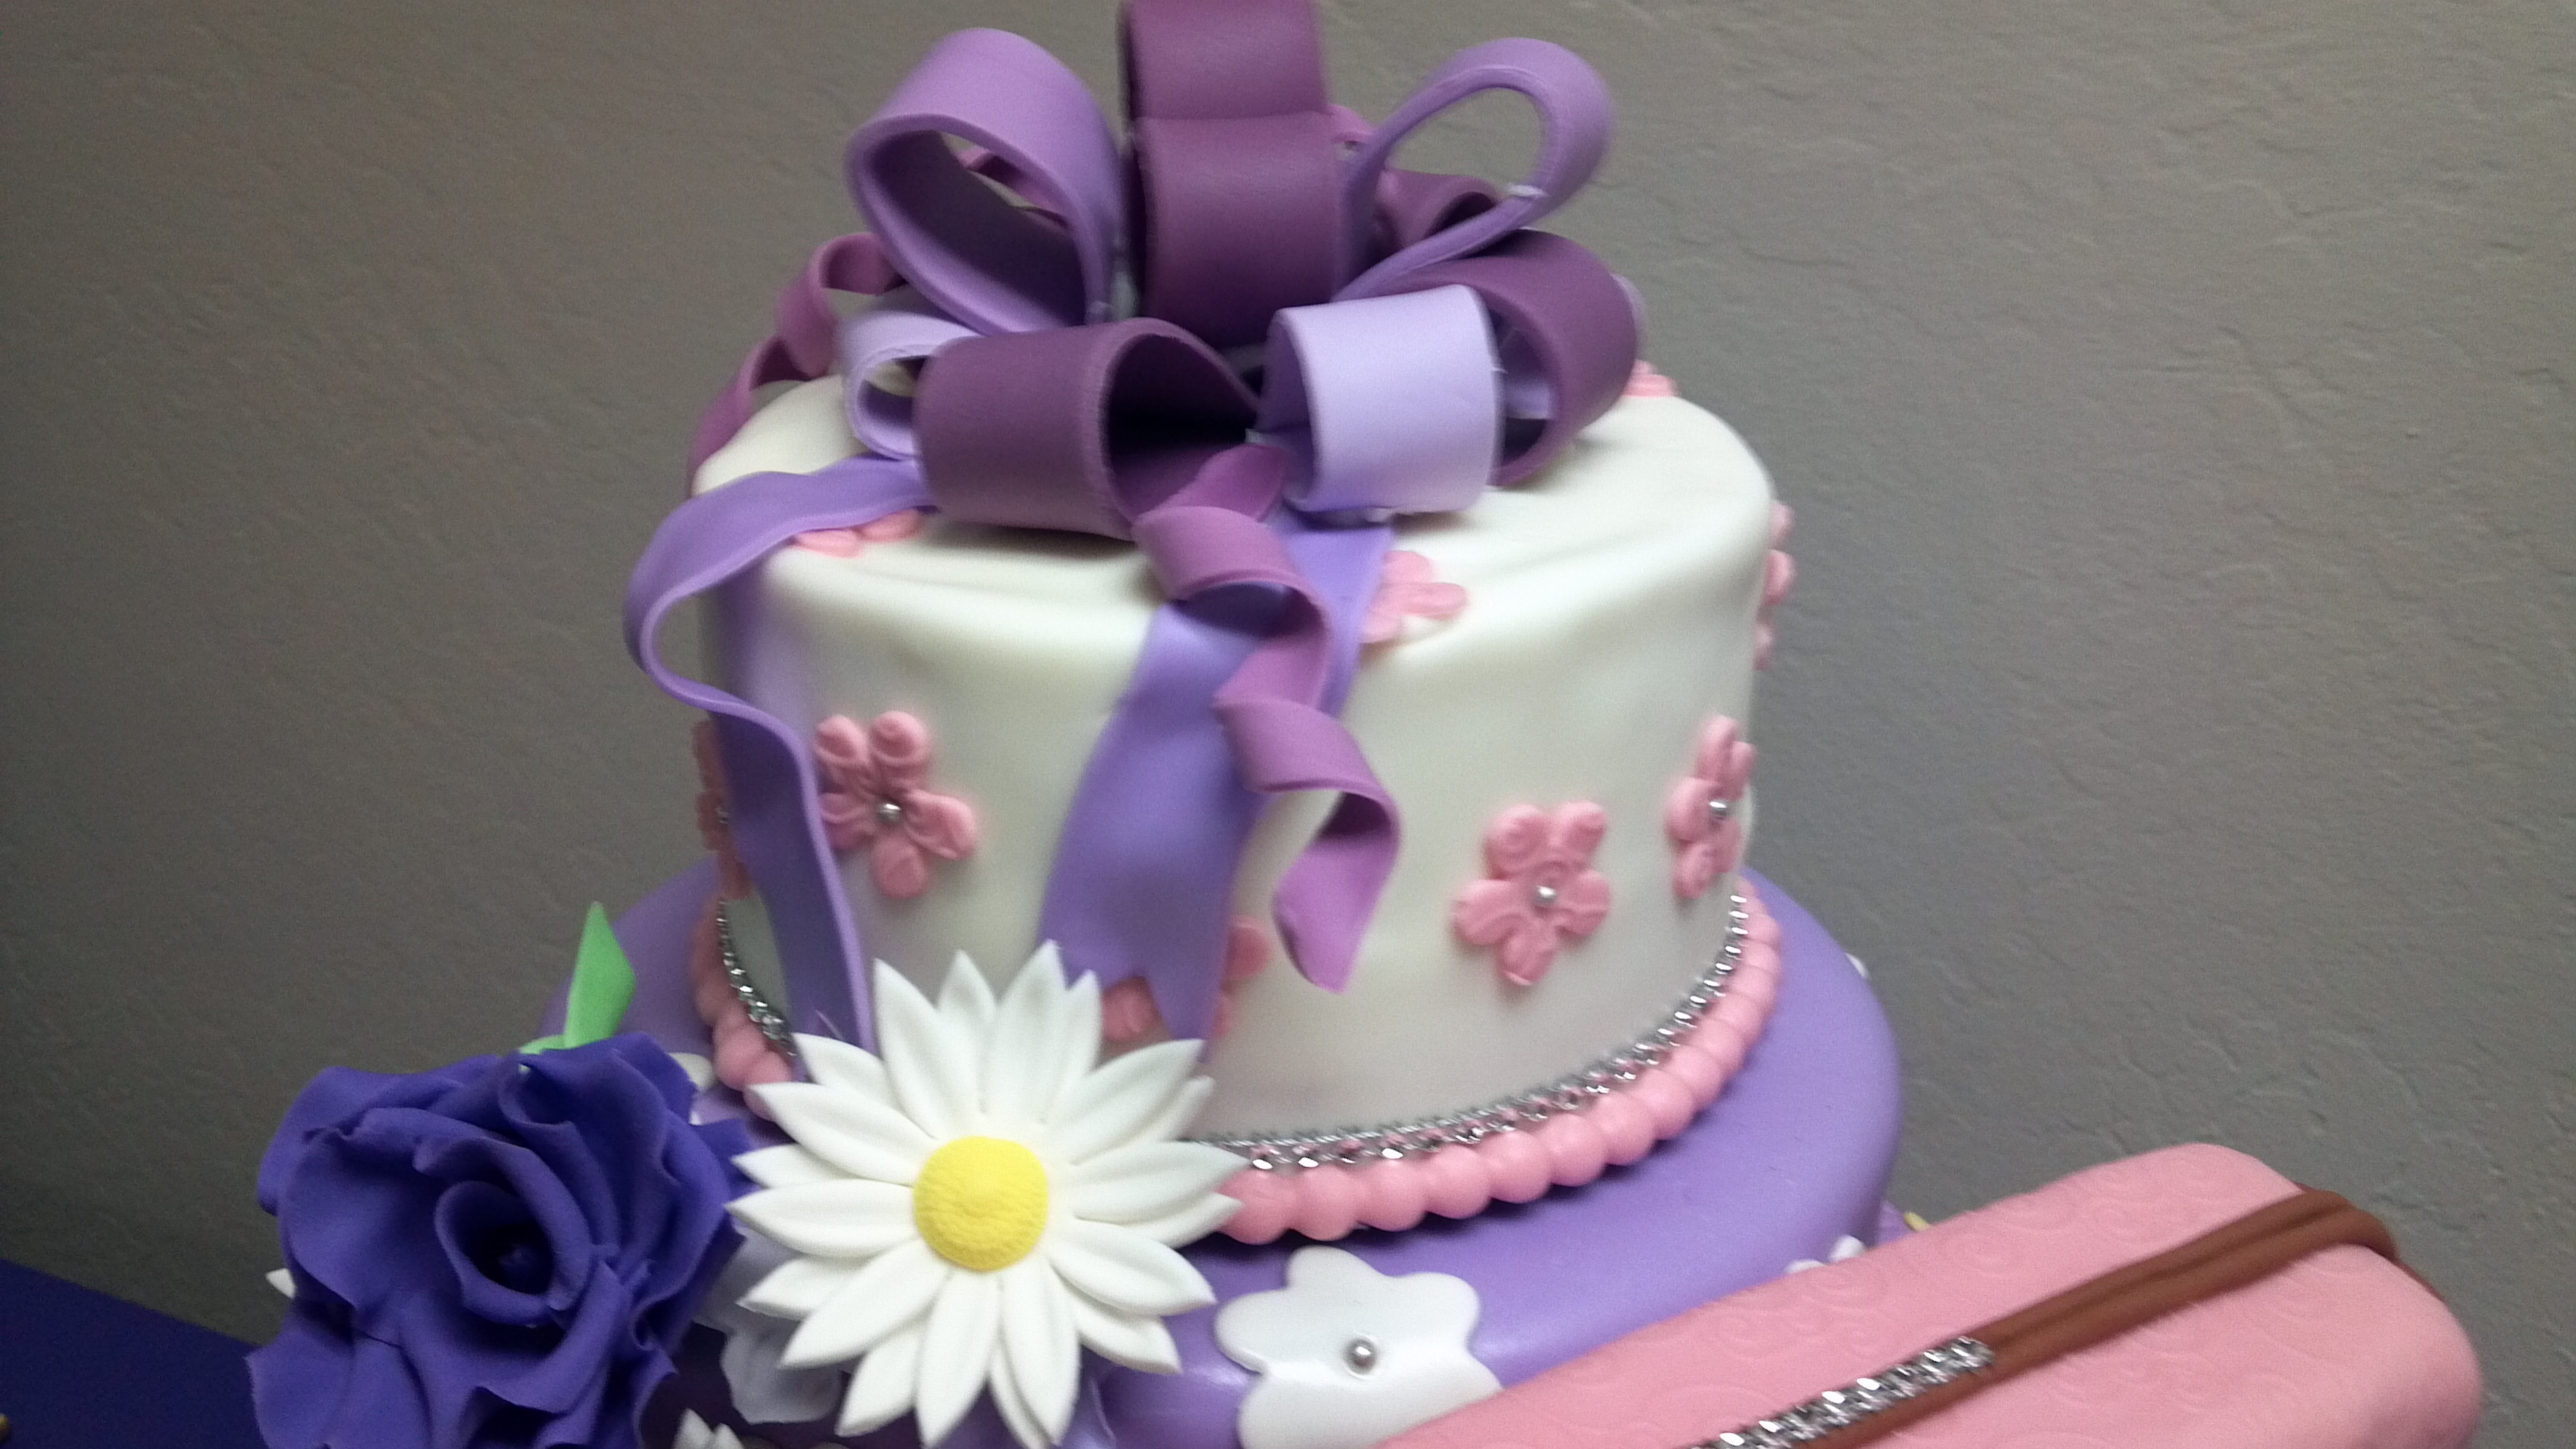 50th Birthday Cake Birthday Gal Likes Purses And Flowers Cake Is